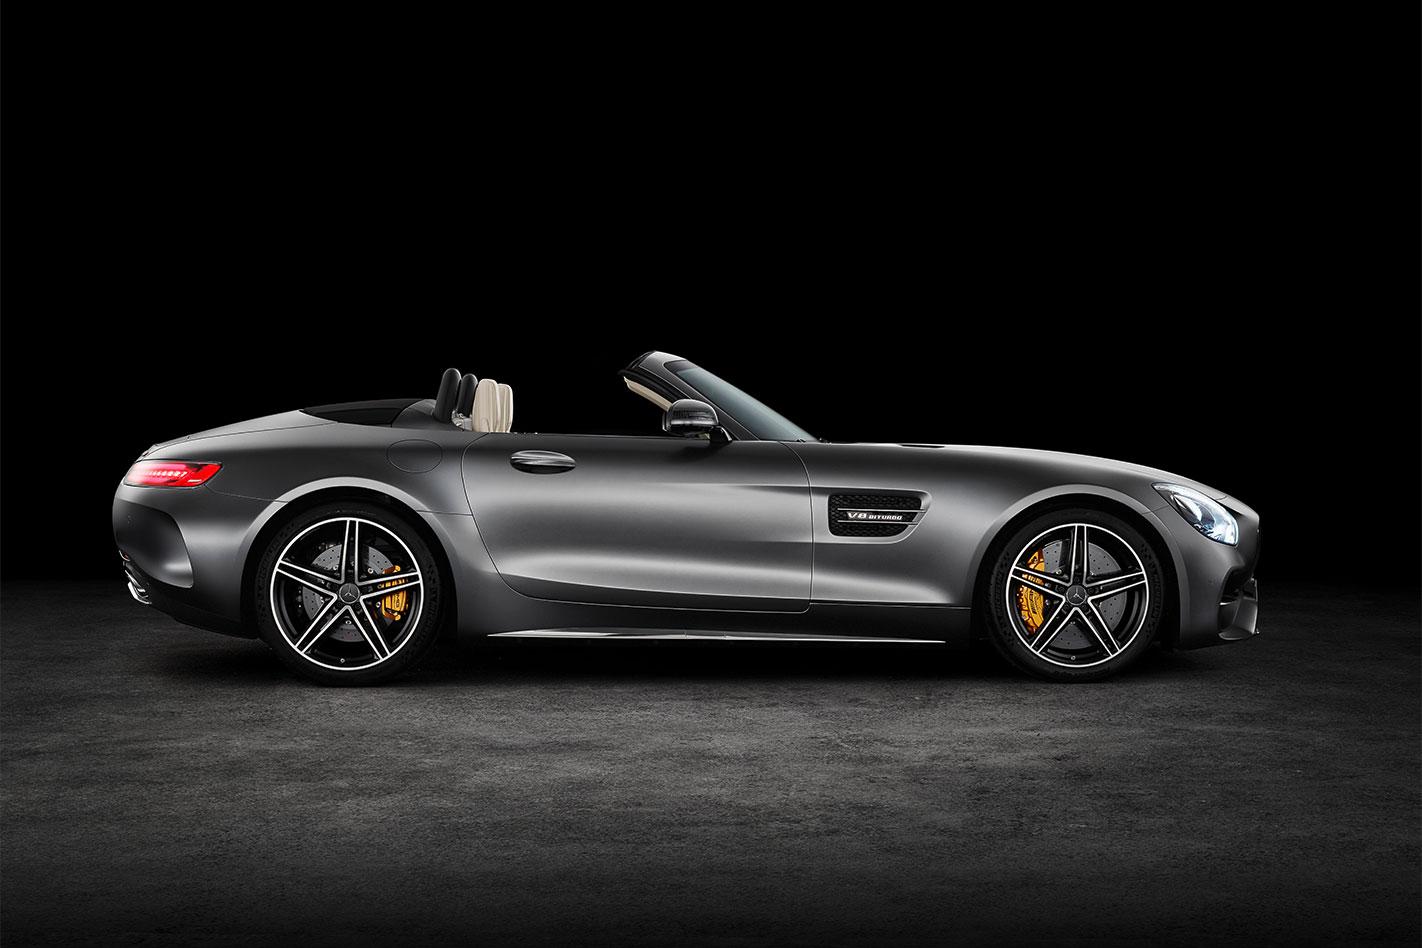 Mercedes-AMG GT C Roadster profile